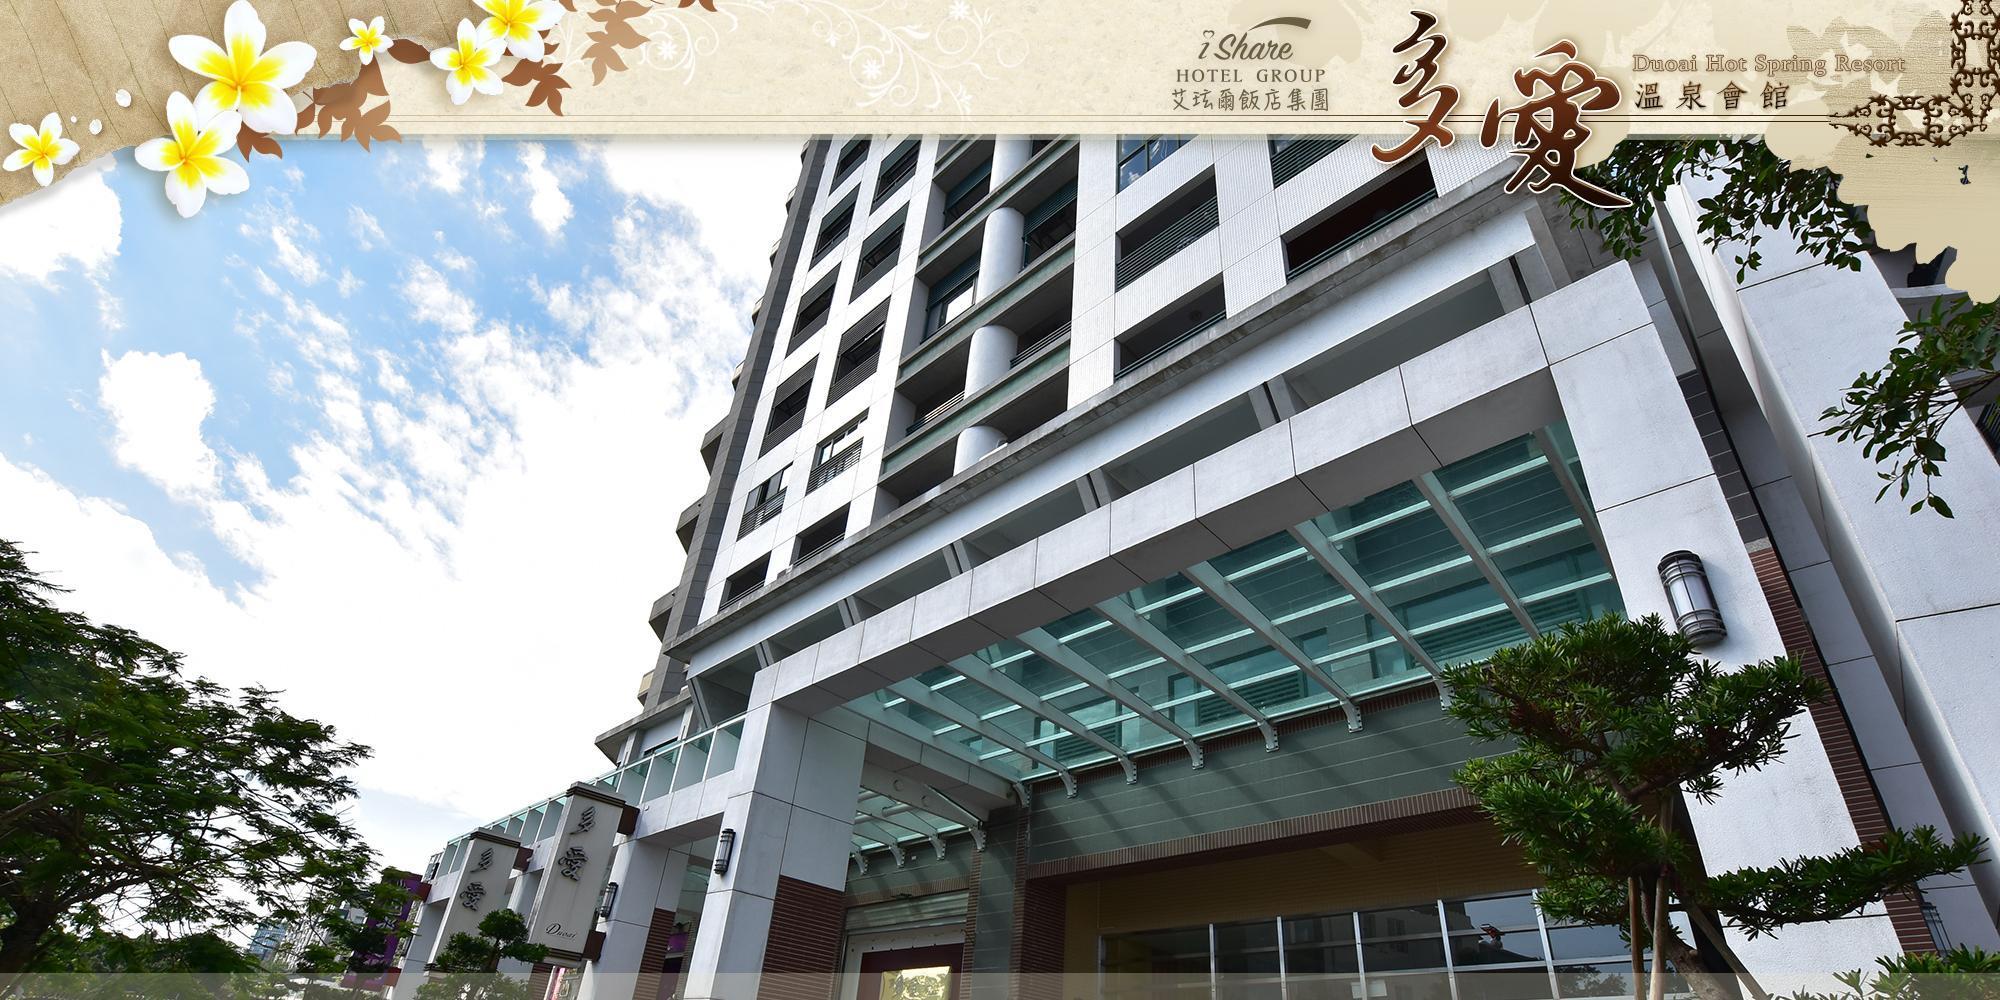 DUOAI HOT SPRING HOTEL